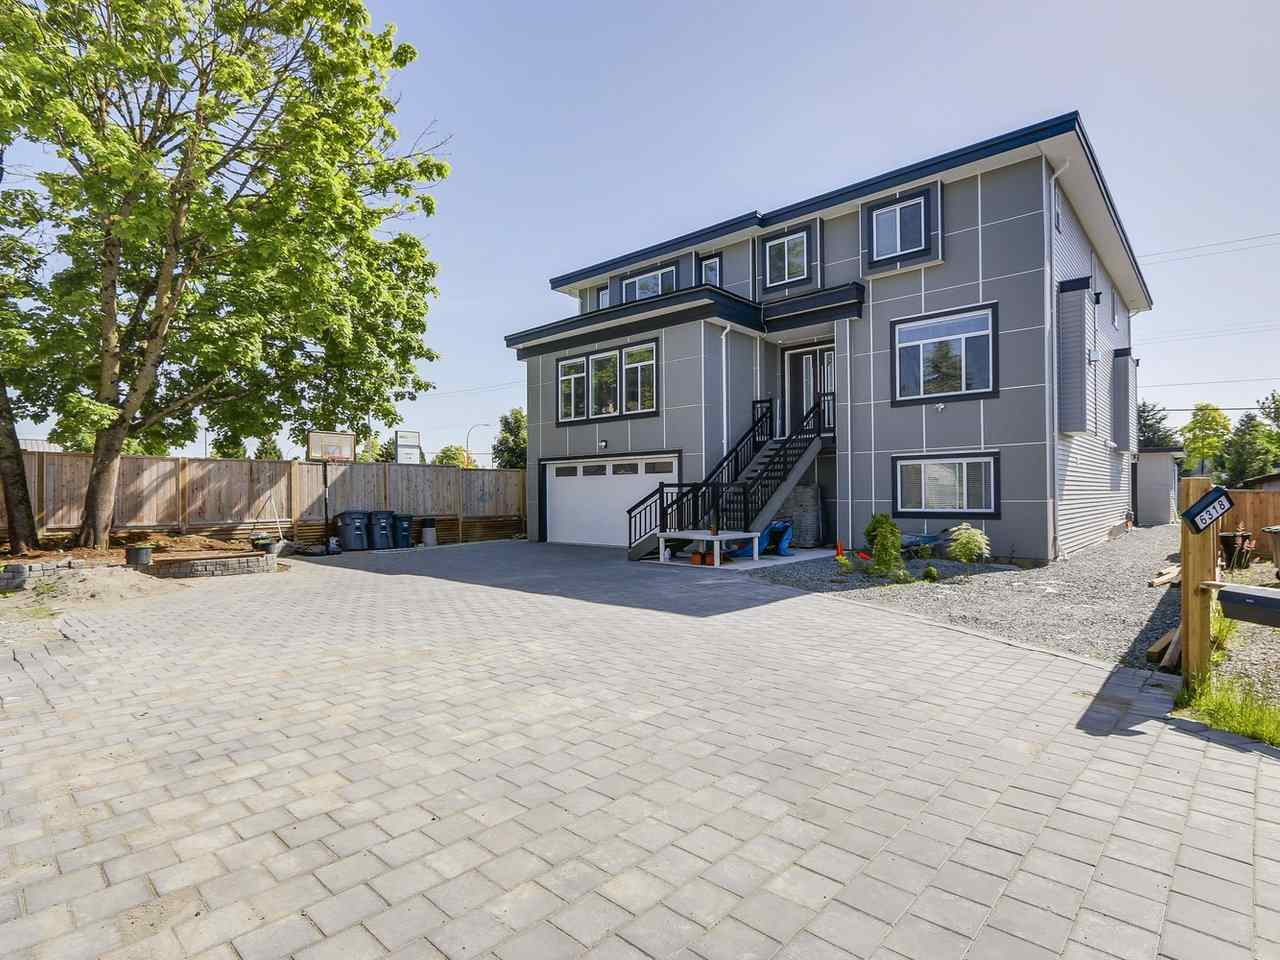 Detached at 6318 175B STREET, Cloverdale, British Columbia. Image 1